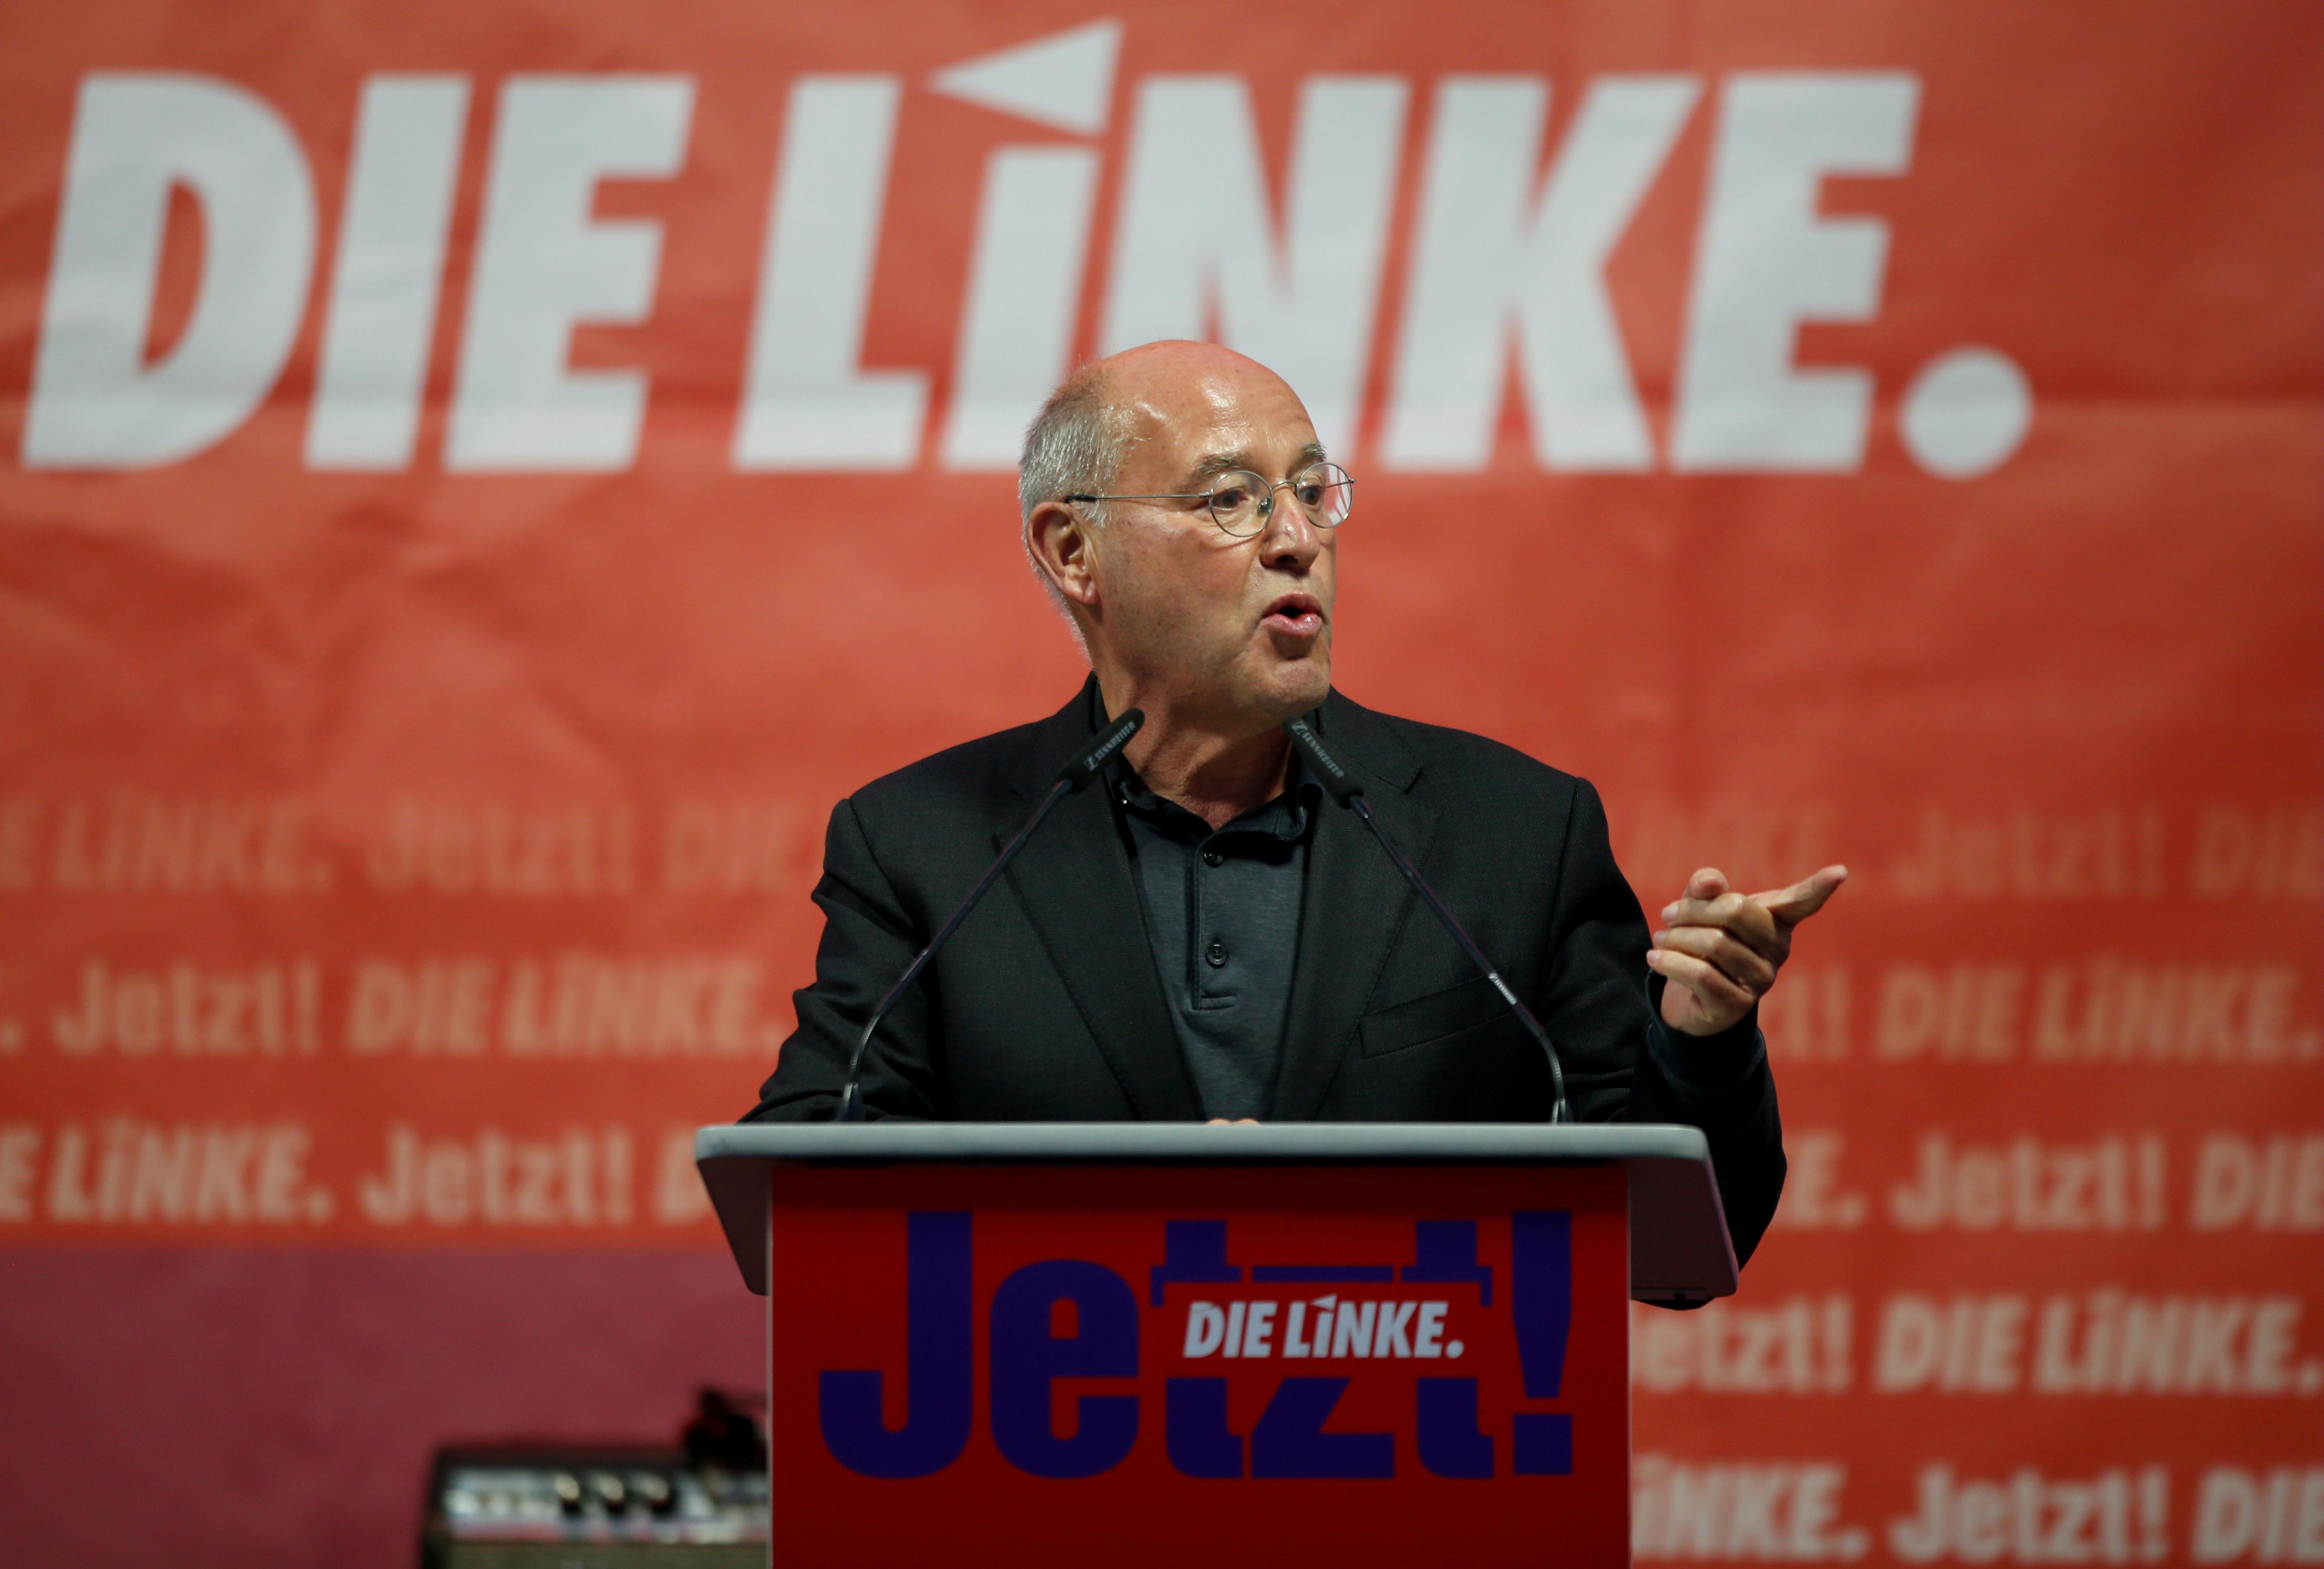 Gregor Gysi vasemmistopuolueesta Die Linke puhuu vaalikampanjan aikana Münchenissä, Saksassa, 17. syyskuuta 2021. REUTERS/Michaela Rehle/File Photo